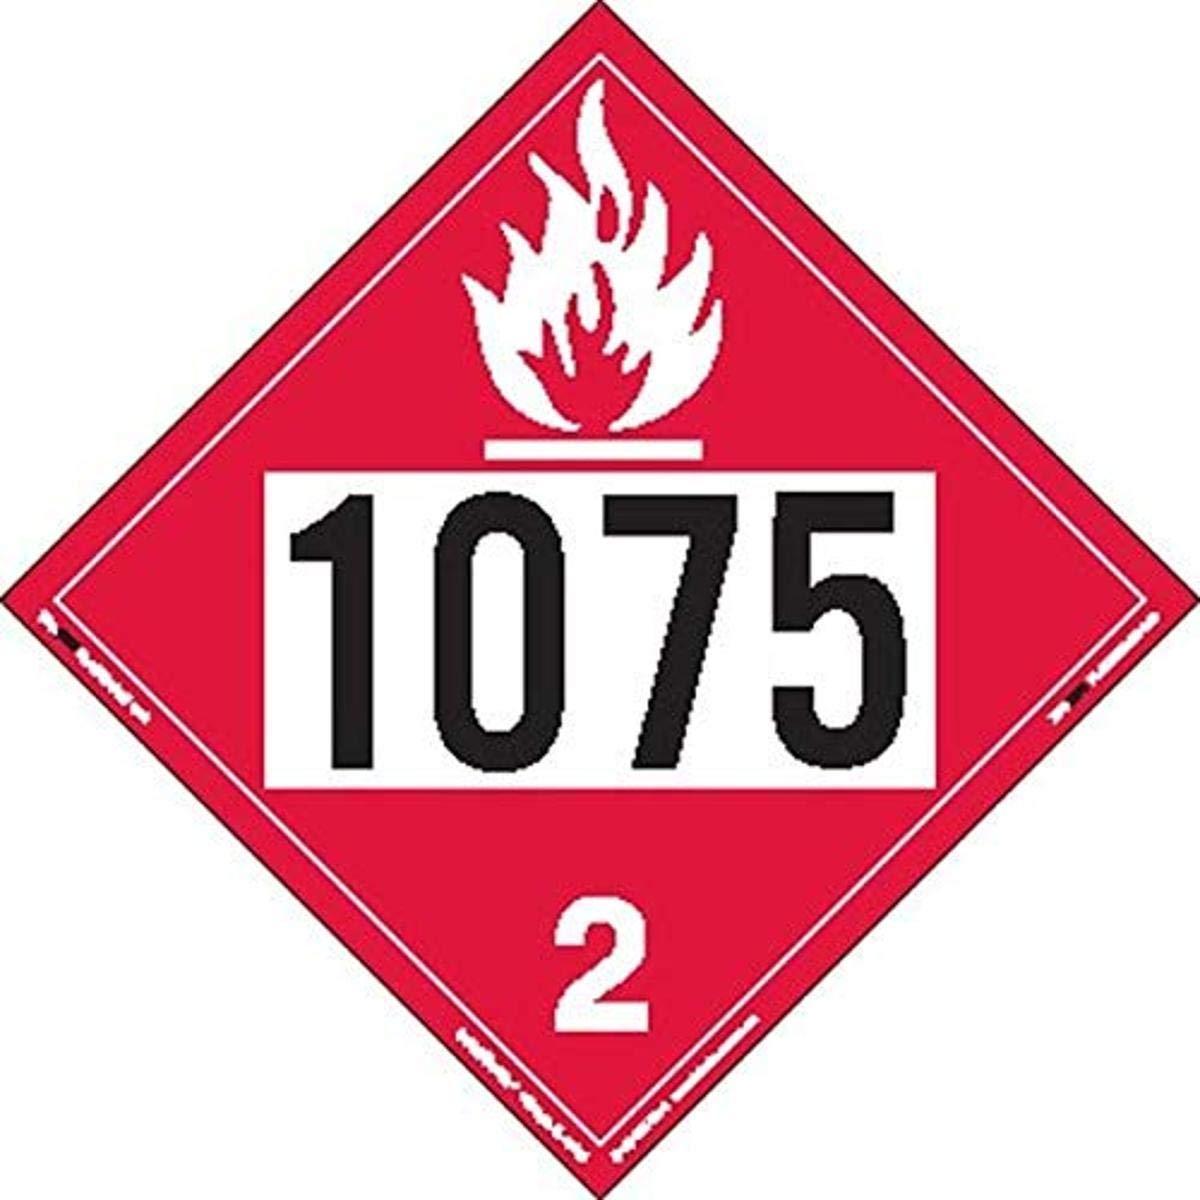 Labelmaster ZT8-1075 UN 1075 Flammable Tagbo Placard Gas Hazmat Great Detroit Mall interest